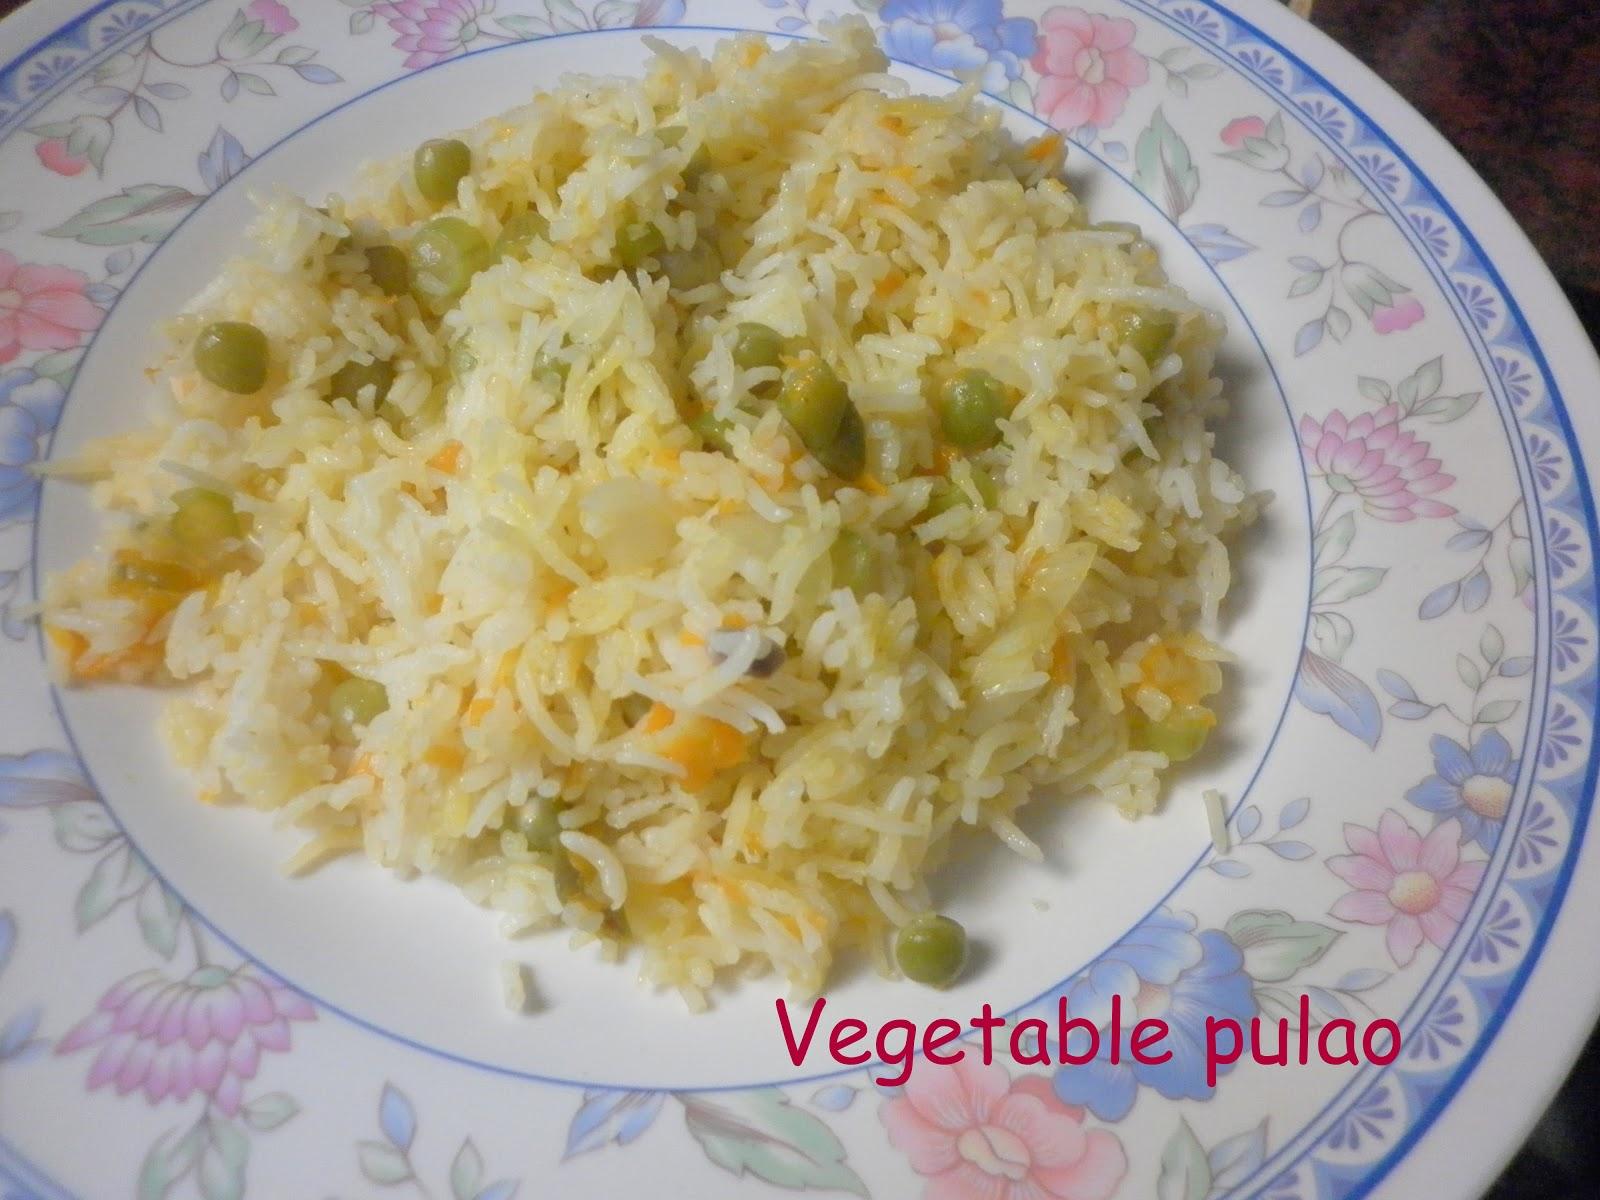 vegatable pulao